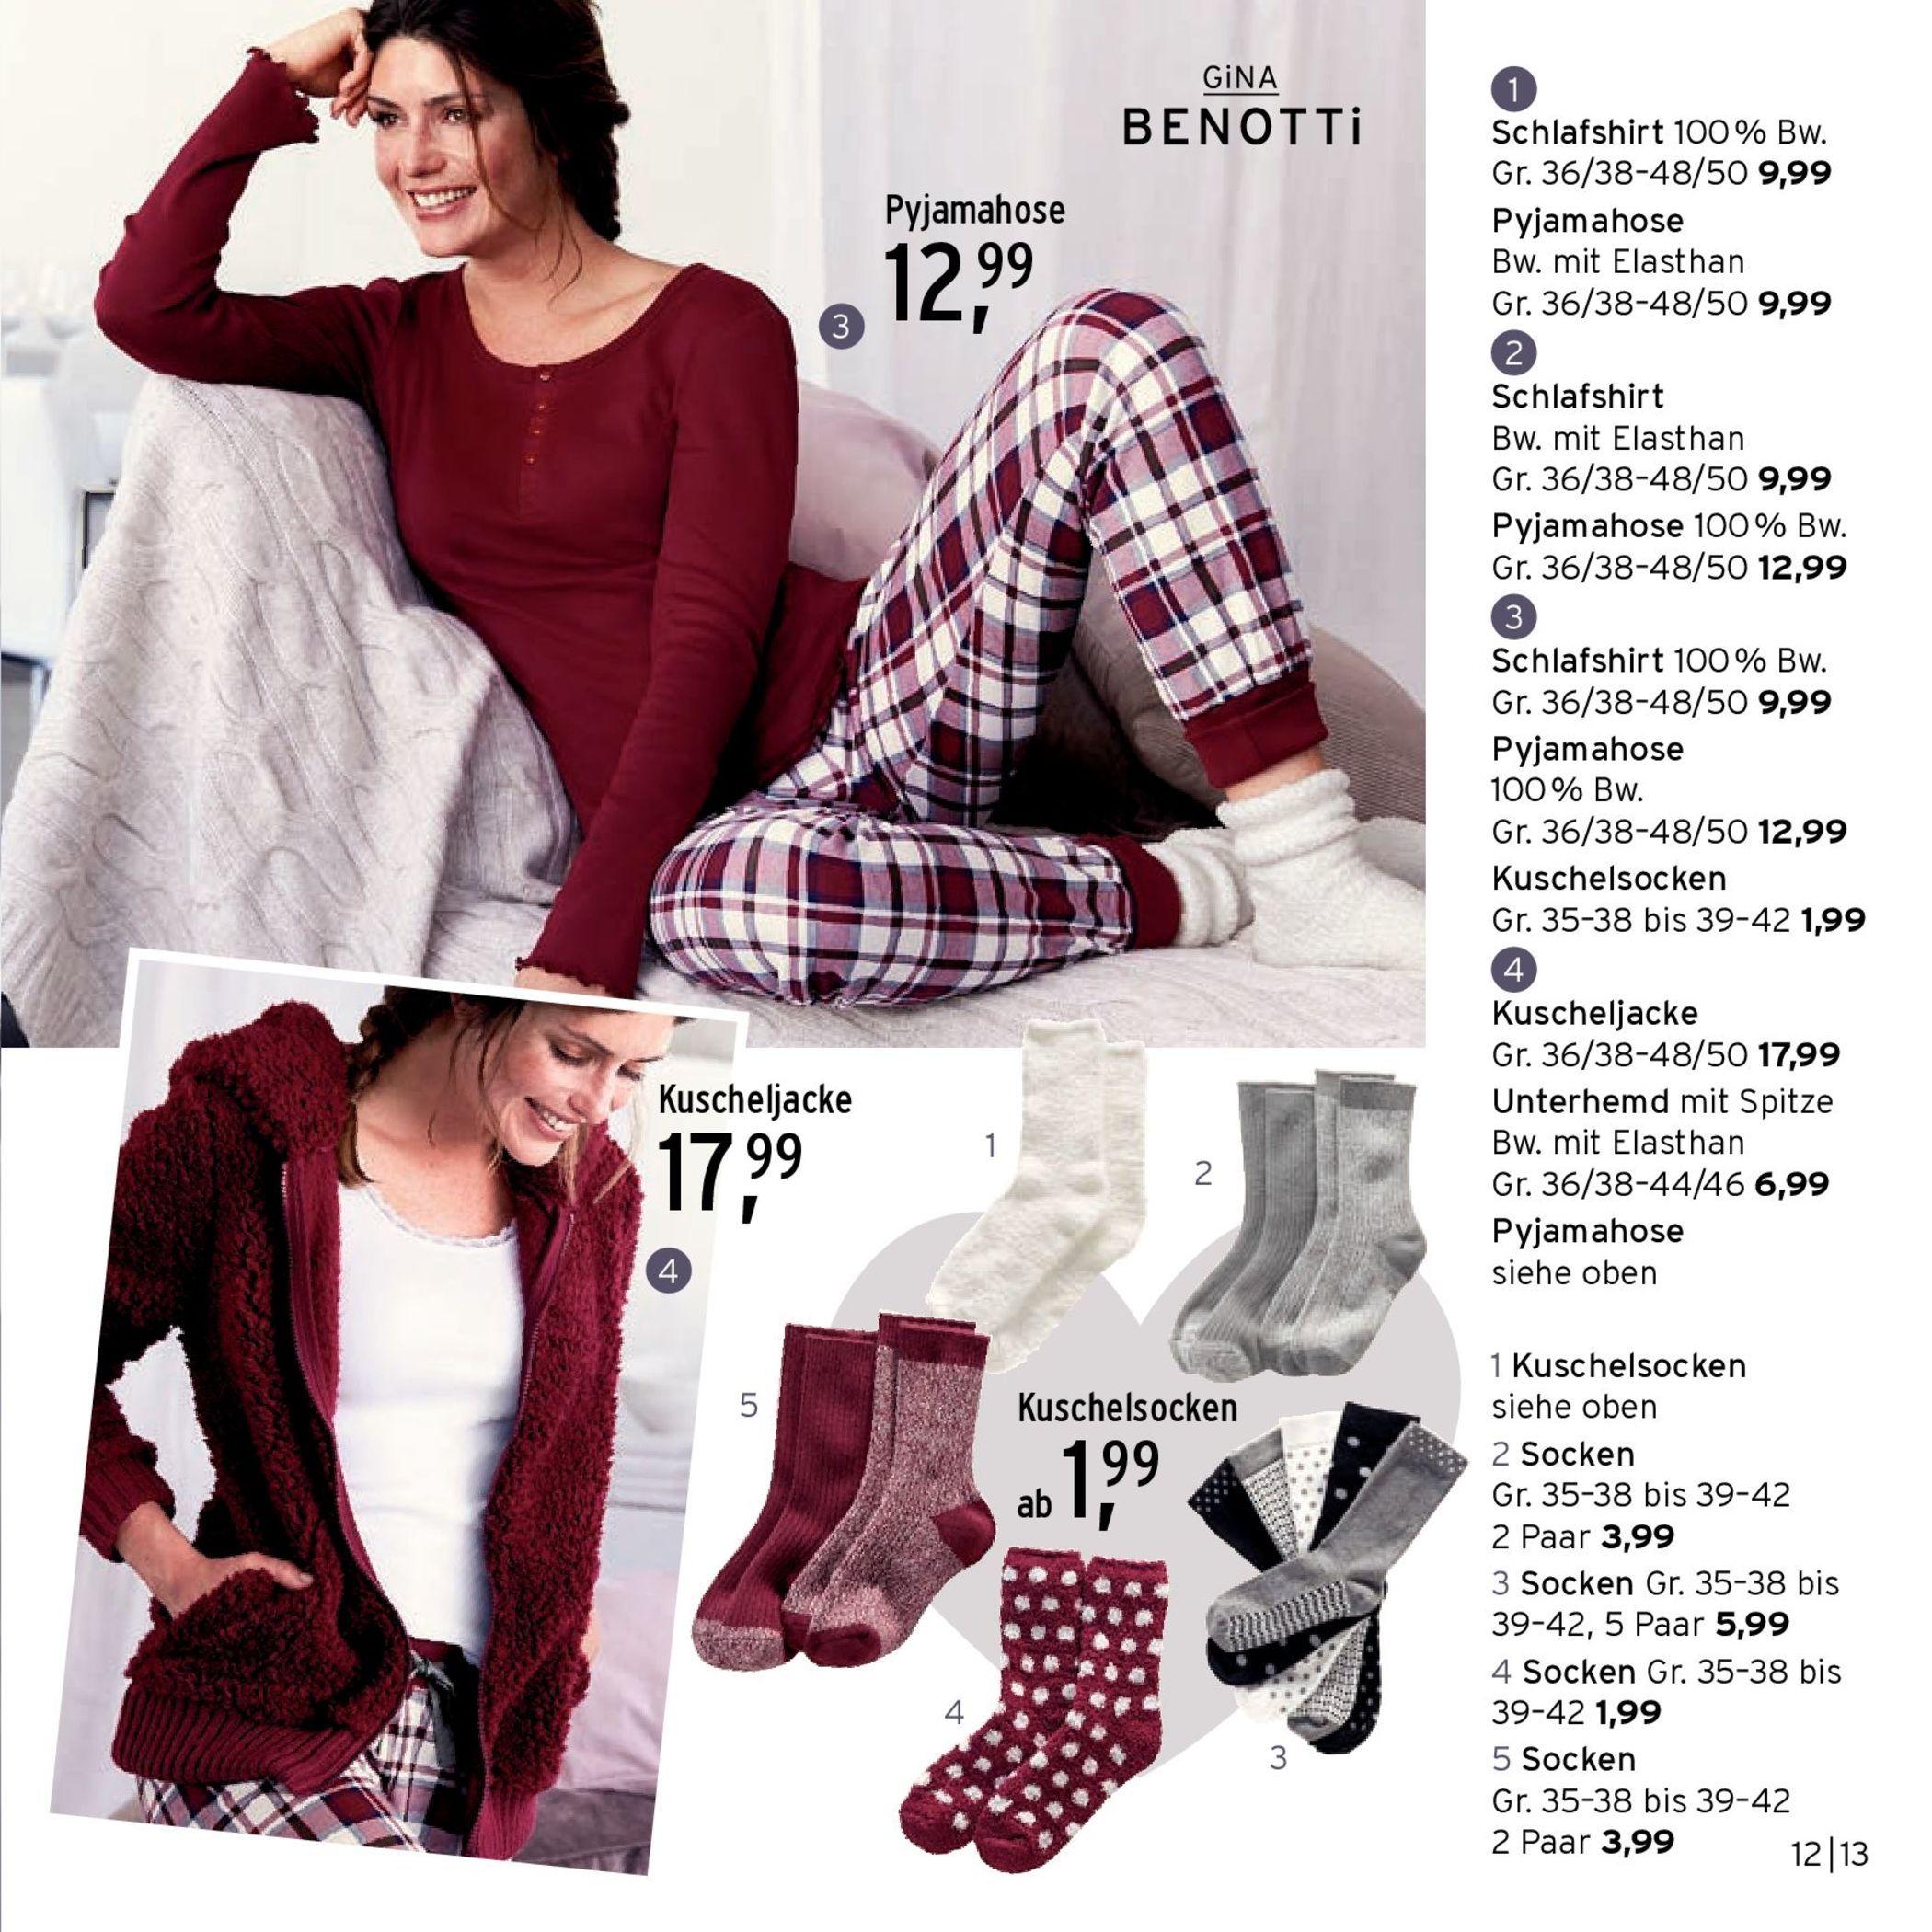 Prospektbox Kuschelzeit Aus Seite 14 Prospekt September 2016 Pyjamahose Schlafshirt Pyjama